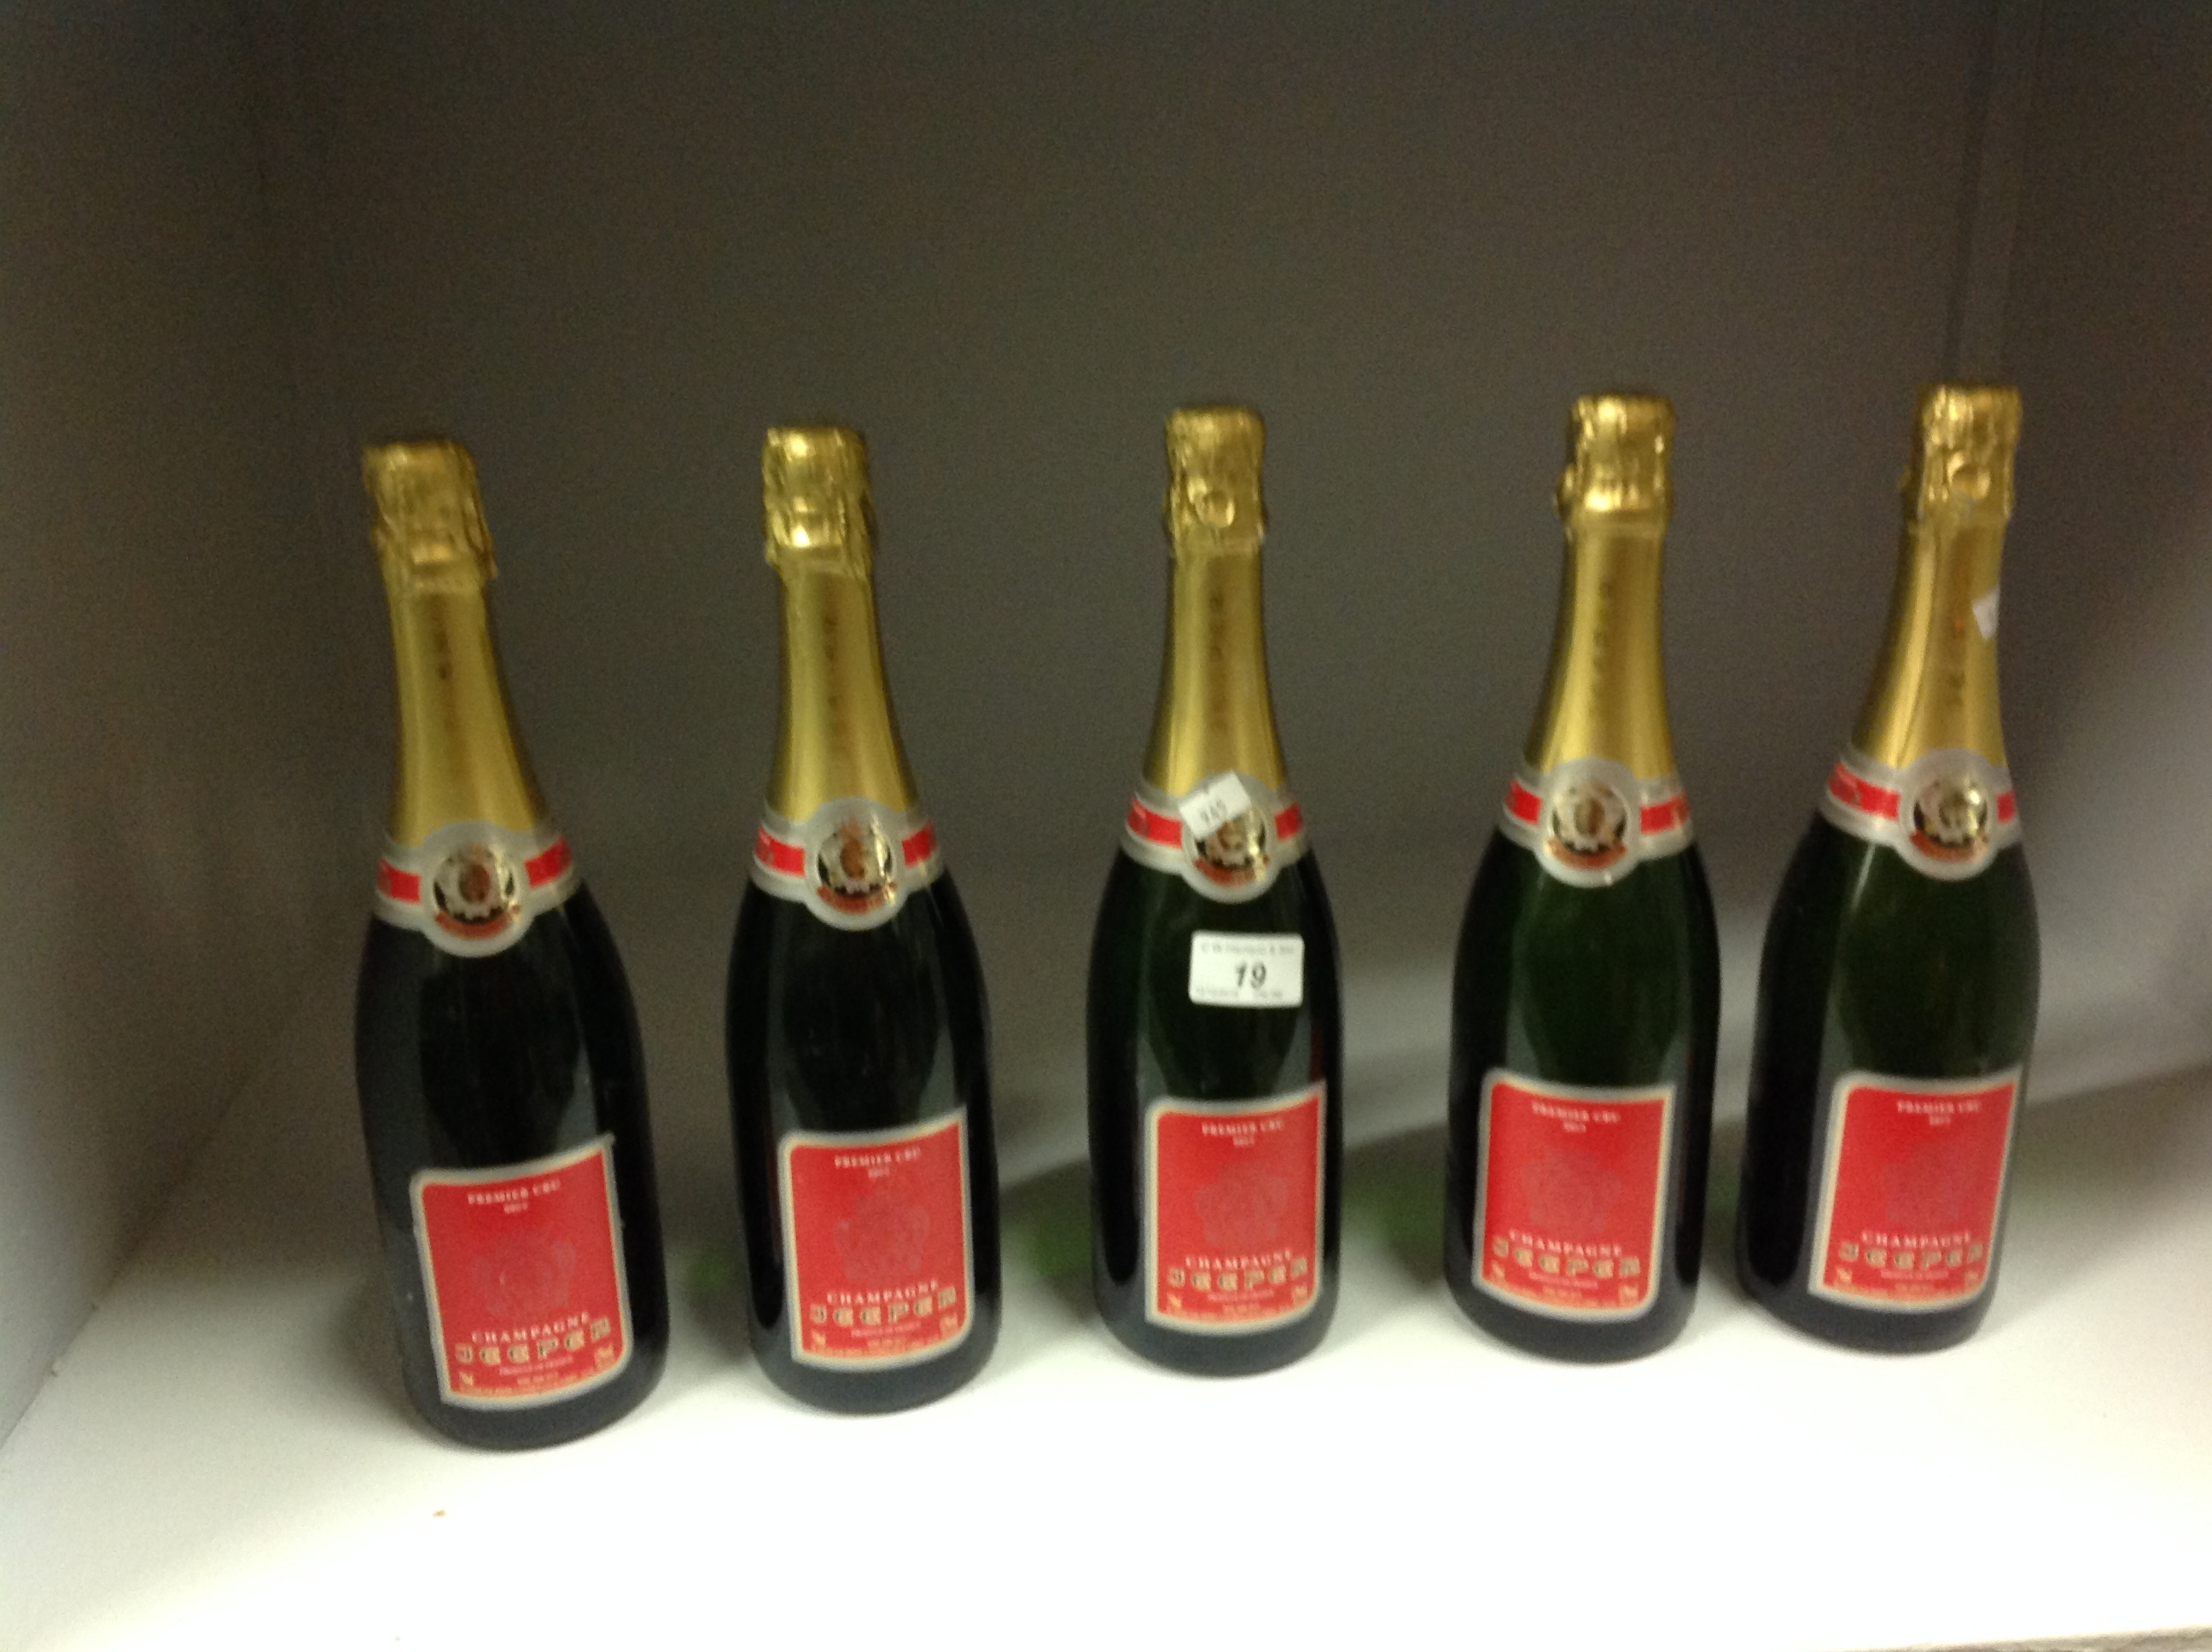 Lot 19 - 5 x 75cl bottles Premier Cru Brut Champa